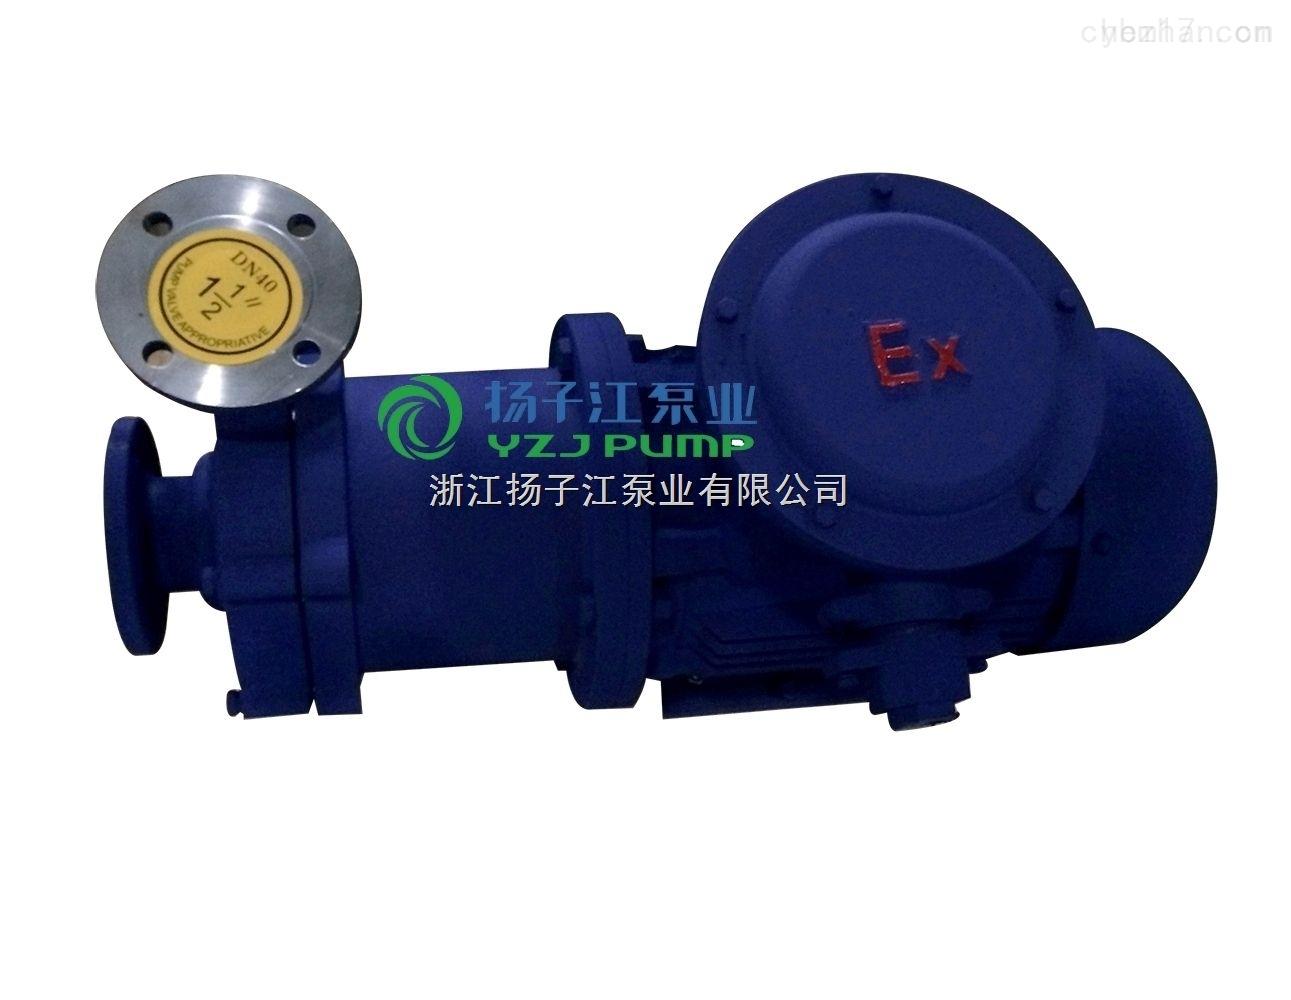 CQ型304/316/316L不锈钢磁力泵|100CQ-32无泄漏防爆不锈钢磁力泵